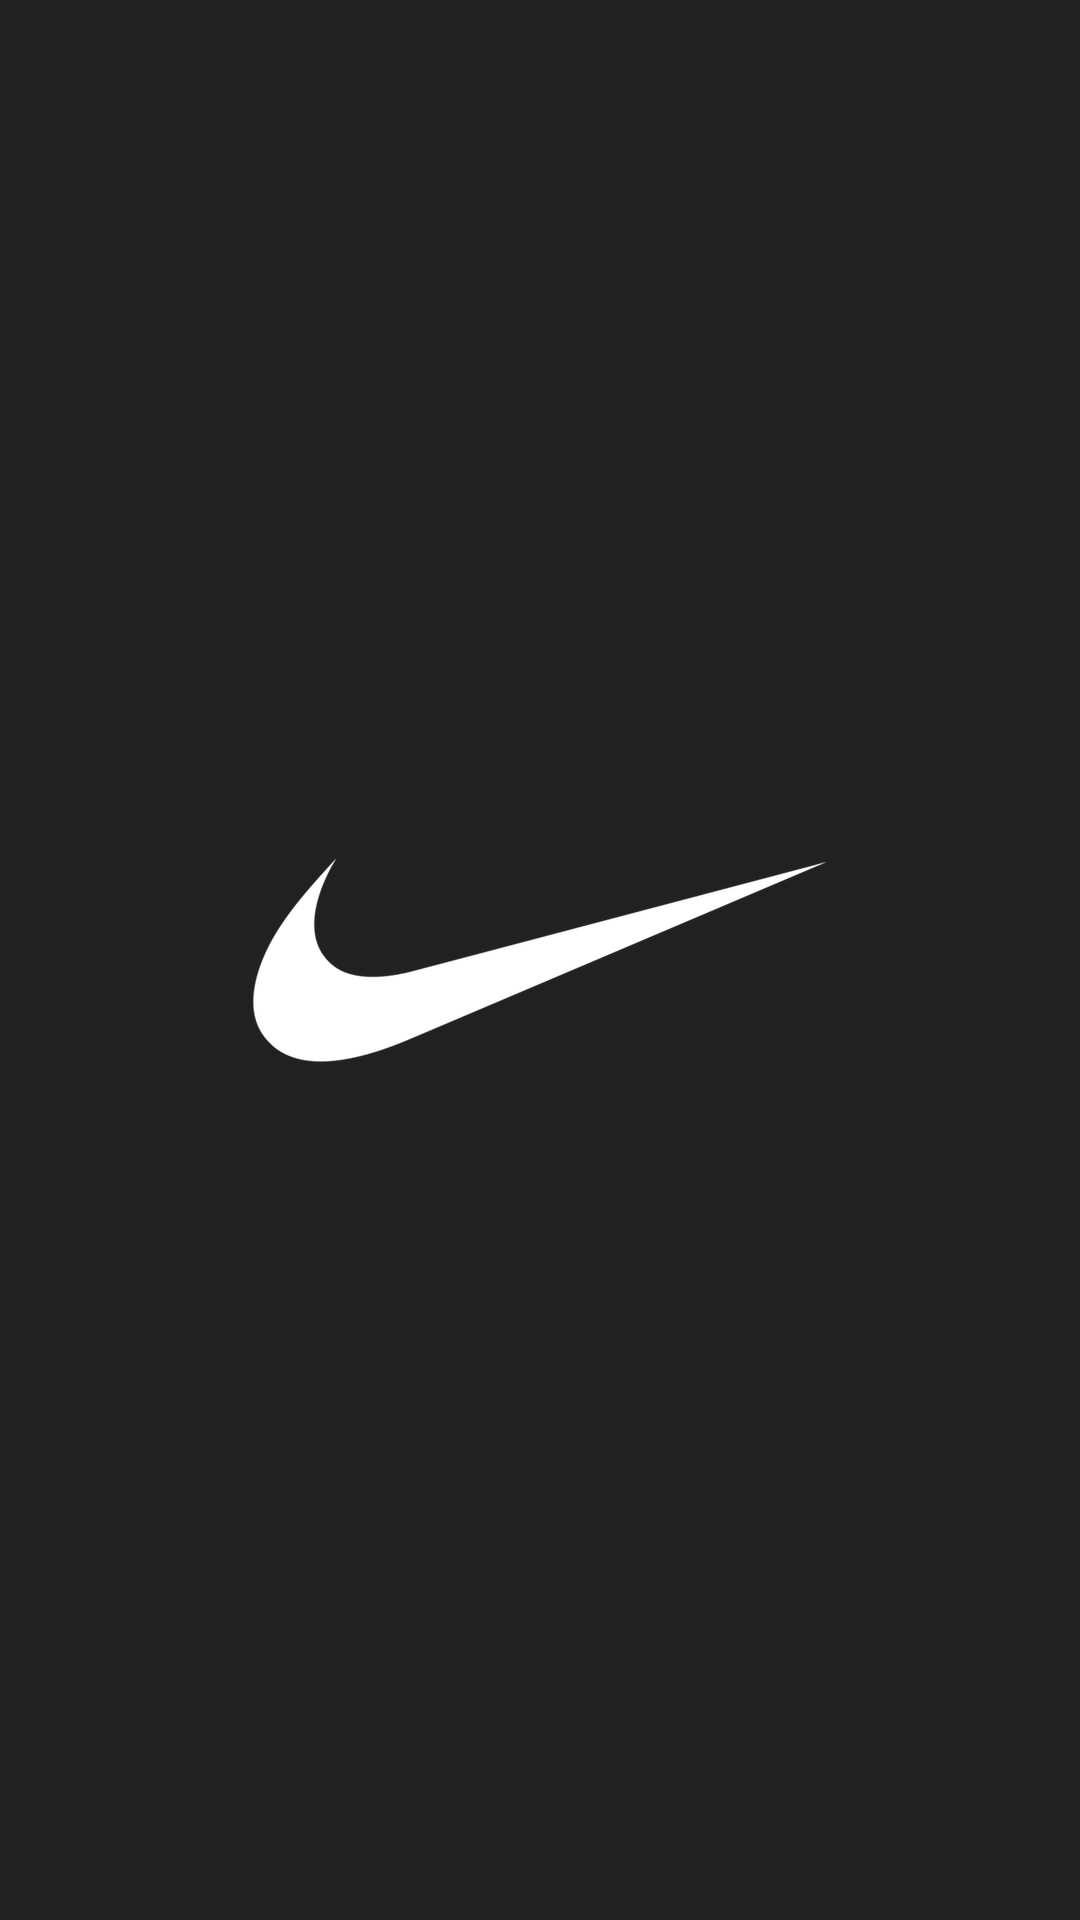 Nike Black iPhone Wallpaper